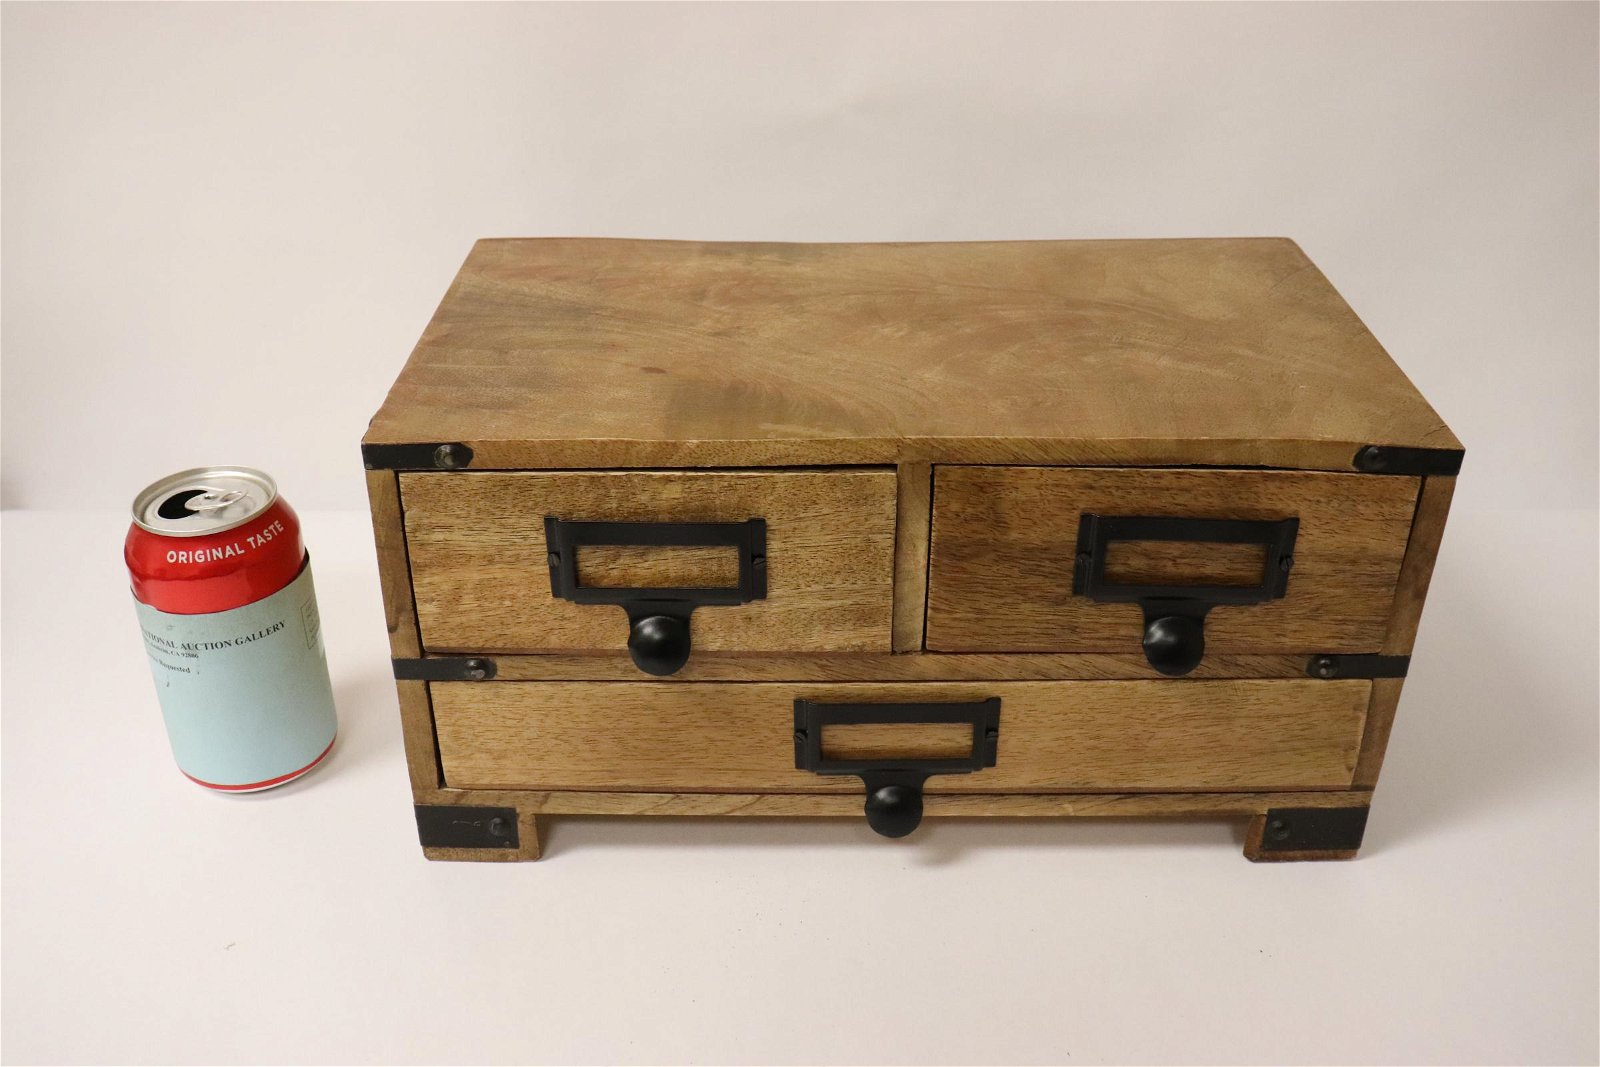 A teak wood miniature chest